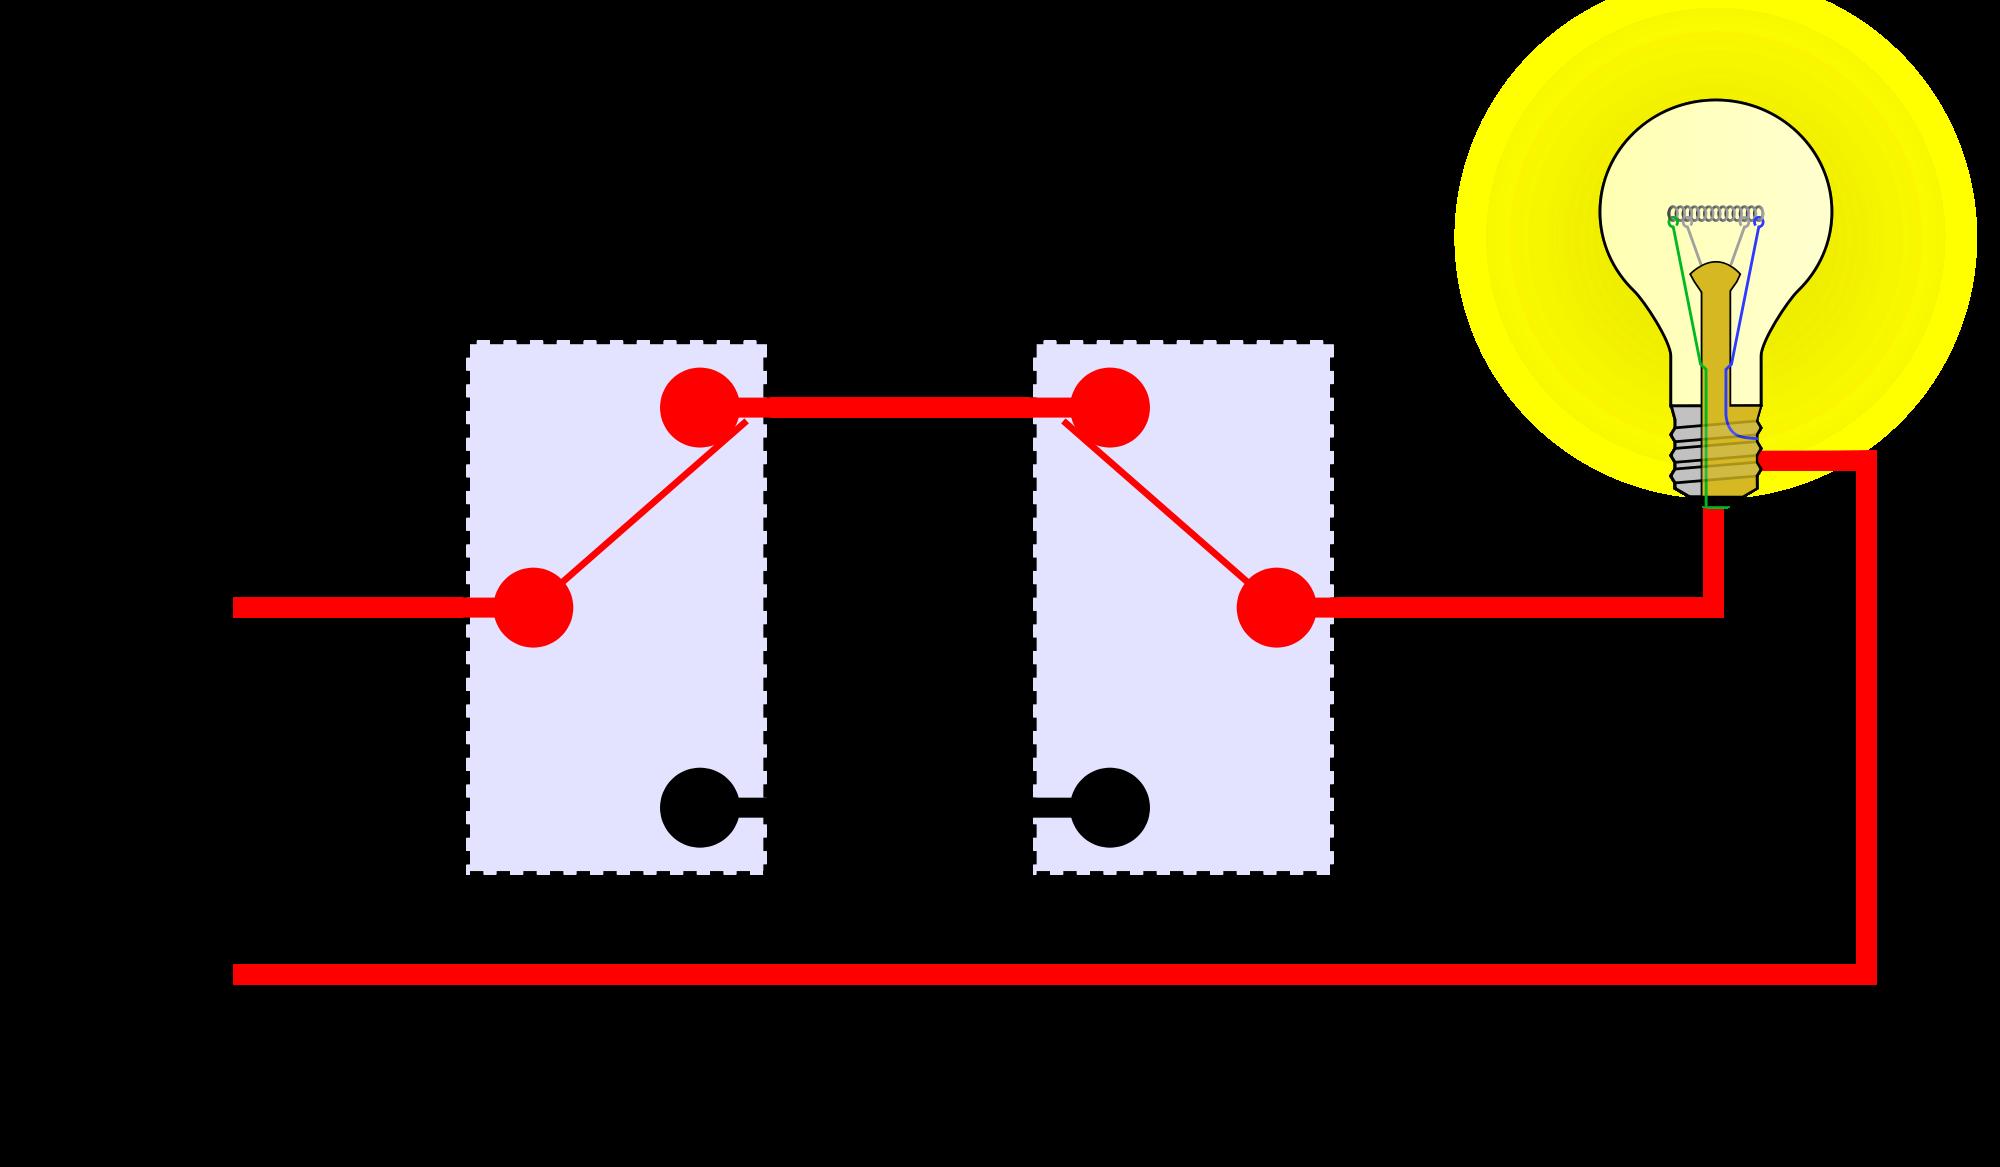 3 Way Switch Work - Wiring Diagram